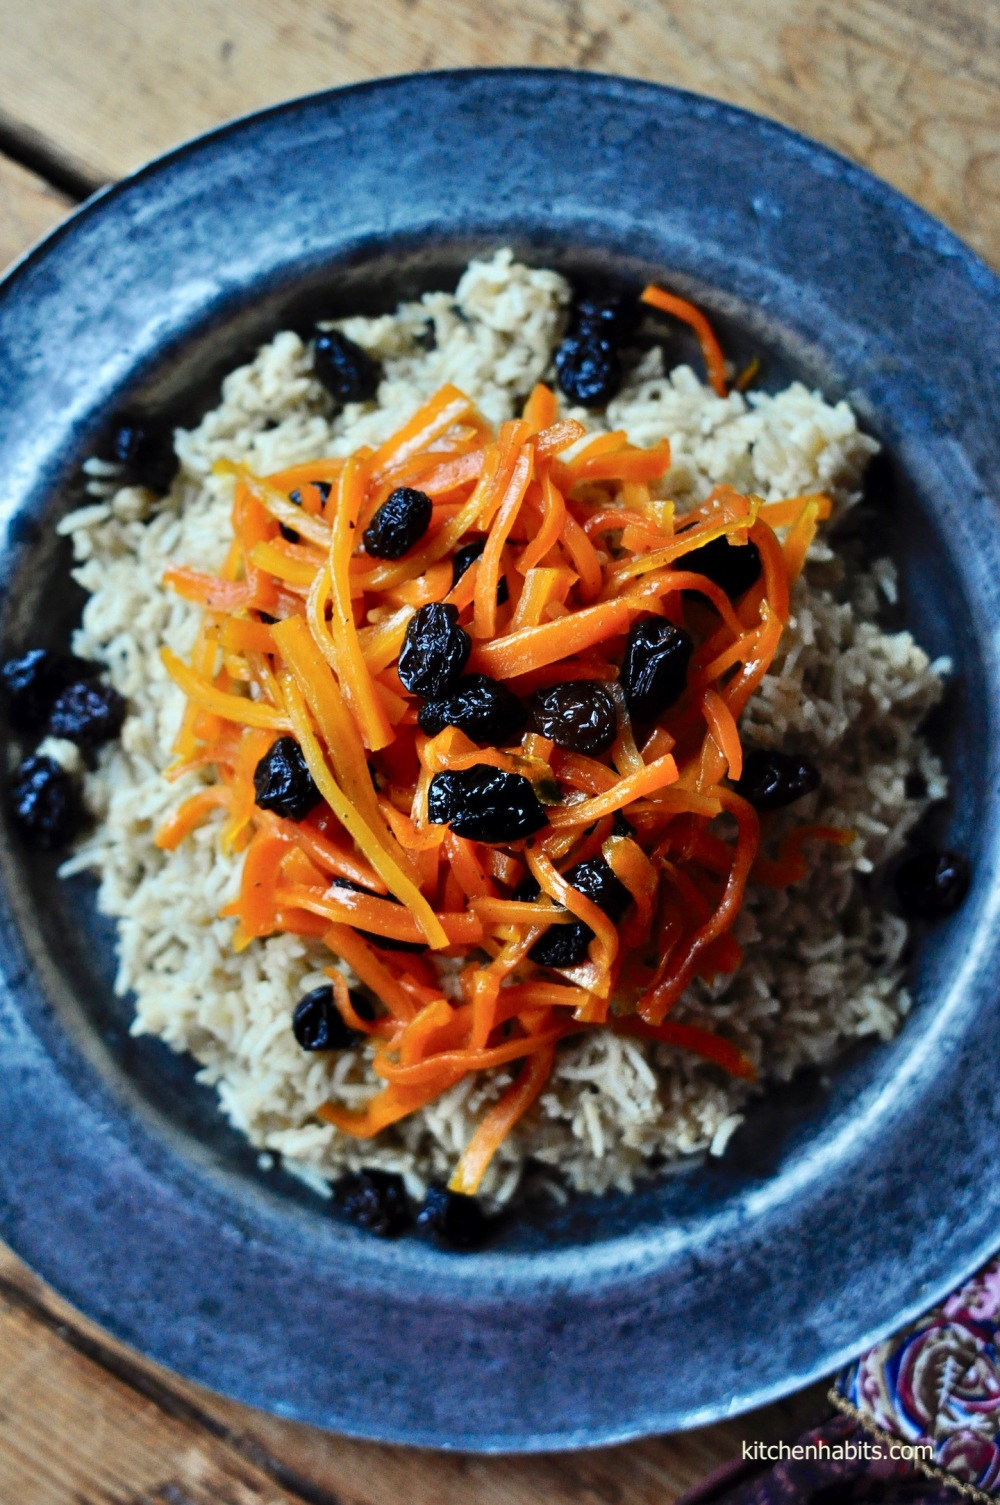 afgan_rice_kitchenhabitscom2